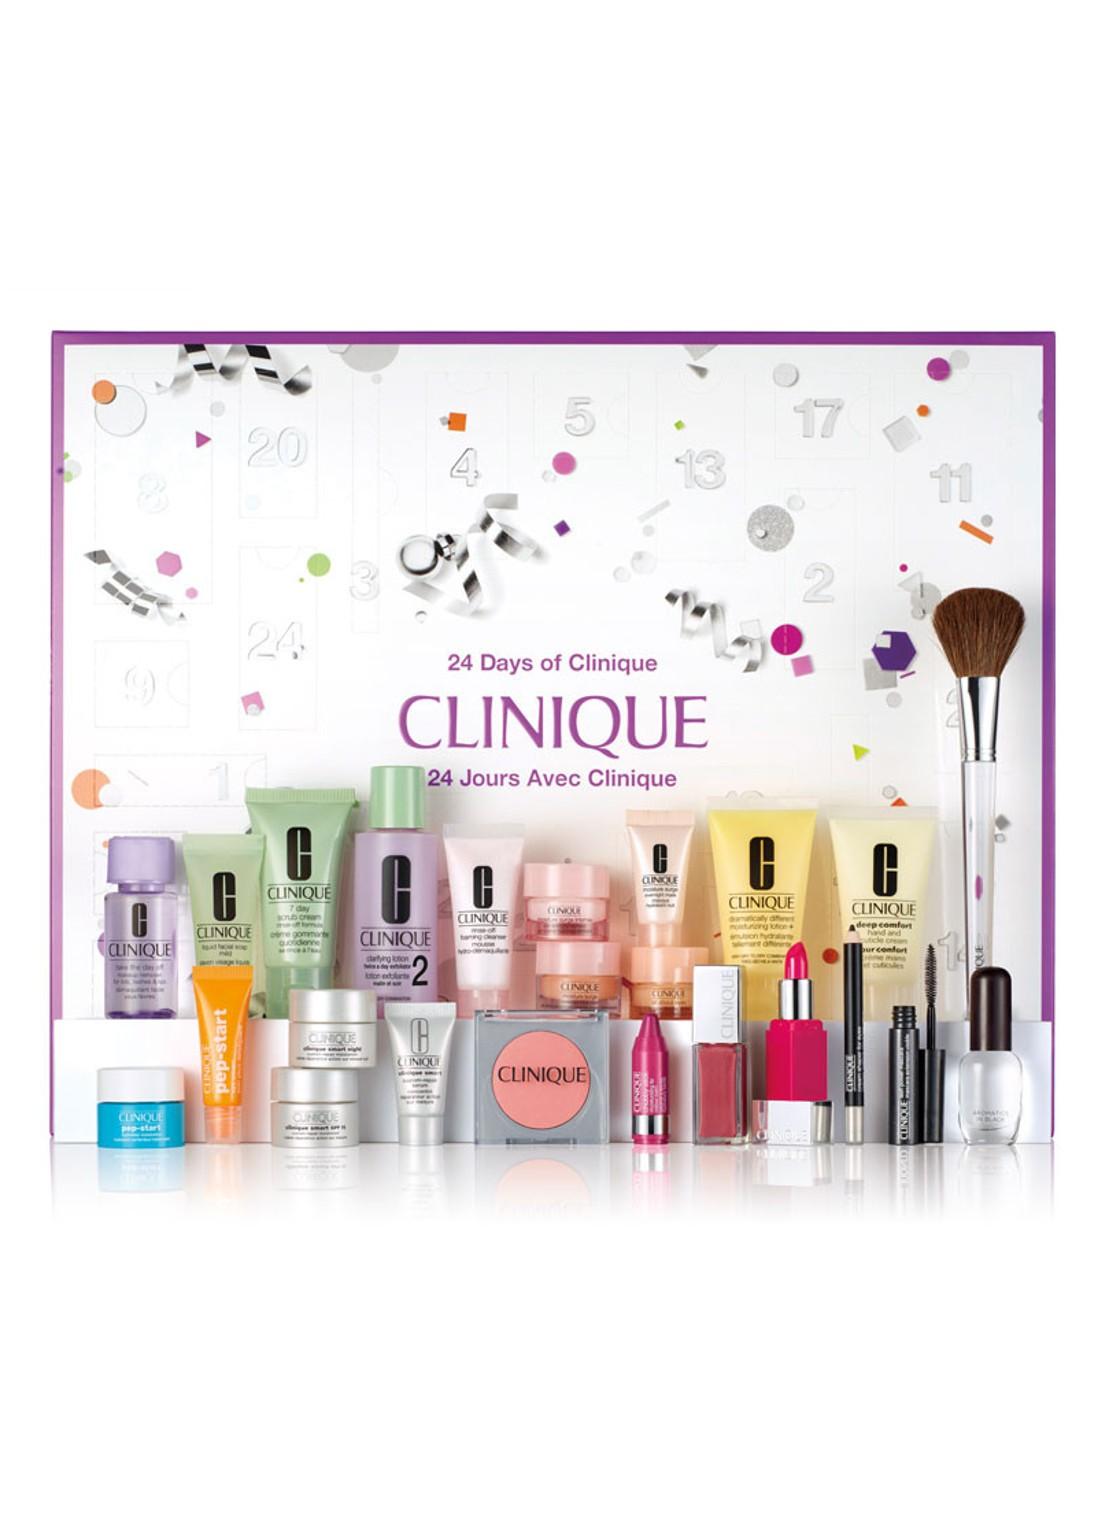 24 Days of Clinique - adventskalender voor €48,30